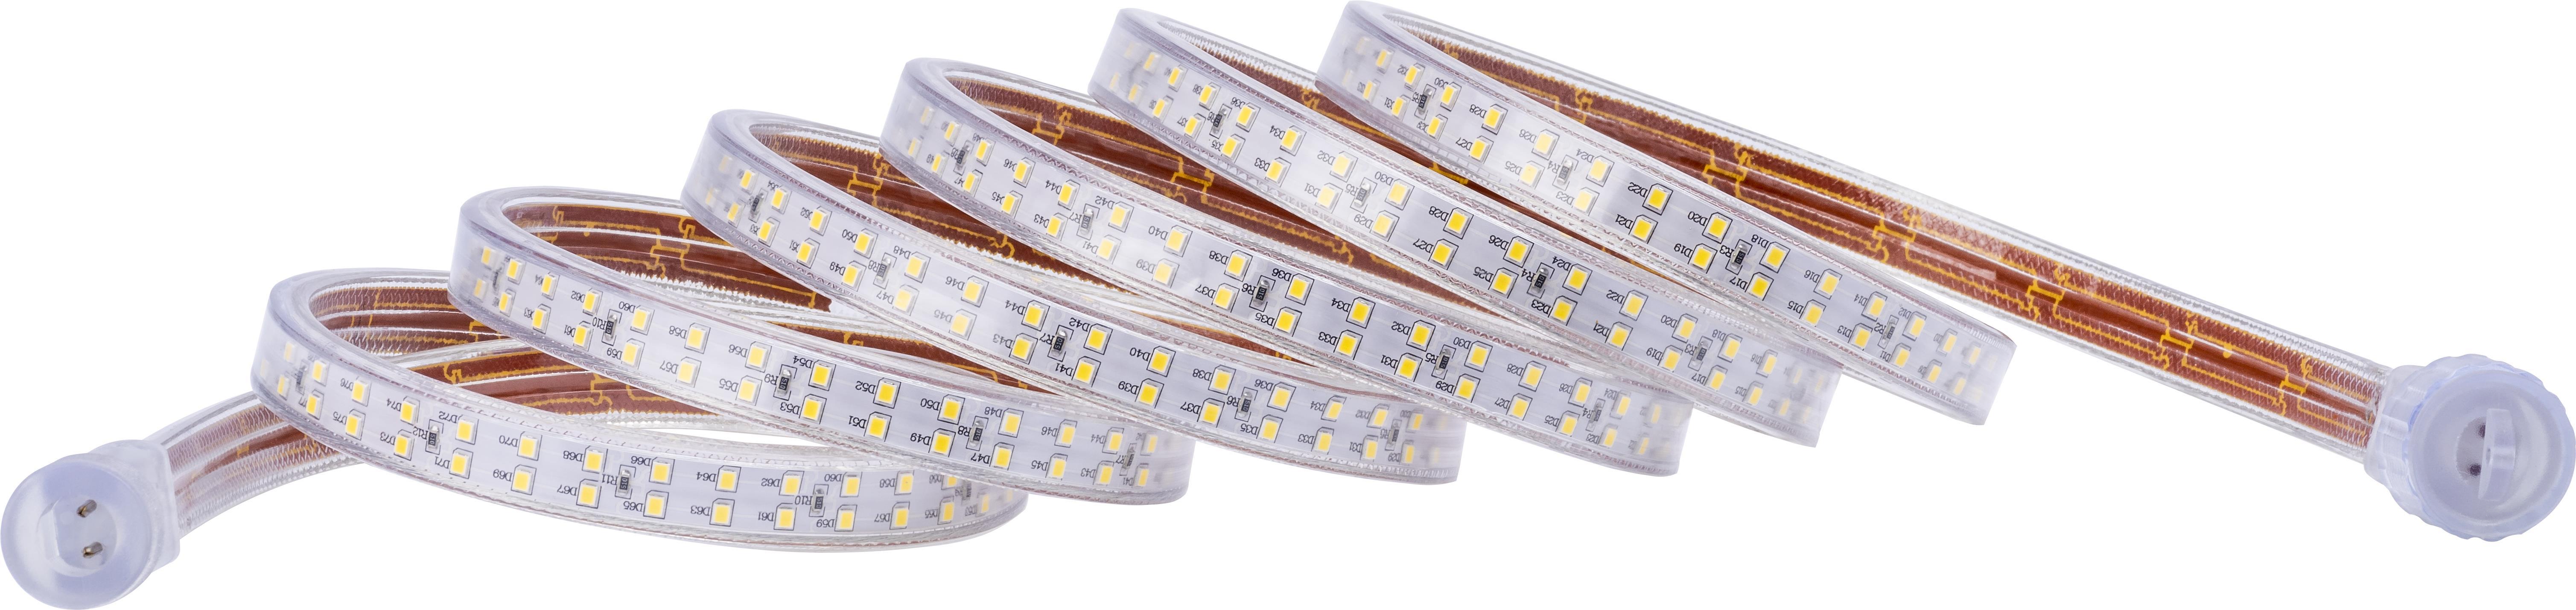 Gelia Rope LED-slinga 36 W 3 m